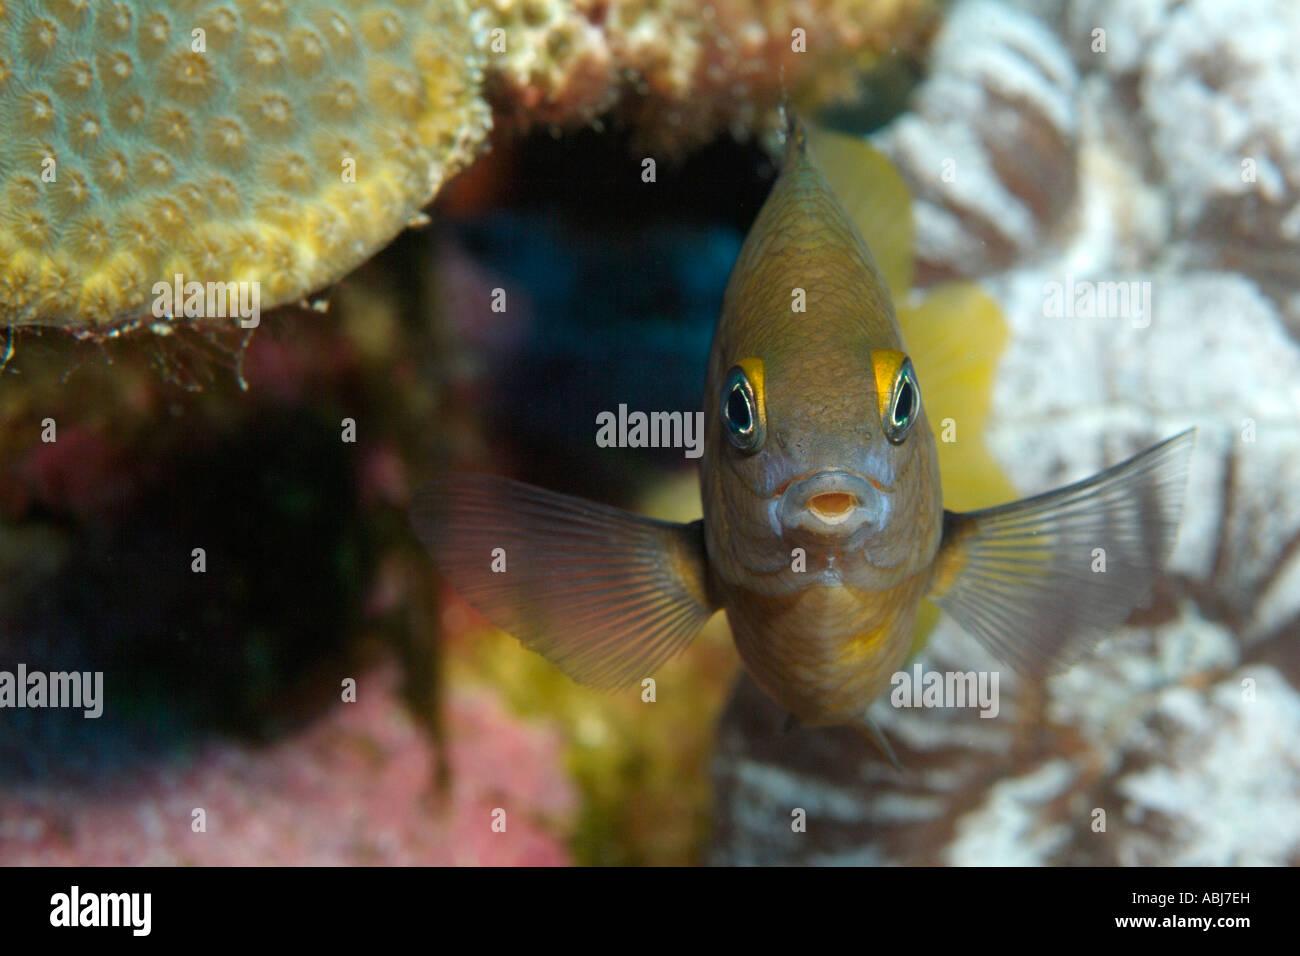 Threespot damisela en jardín de flores en el Golfo de México Foto de stock